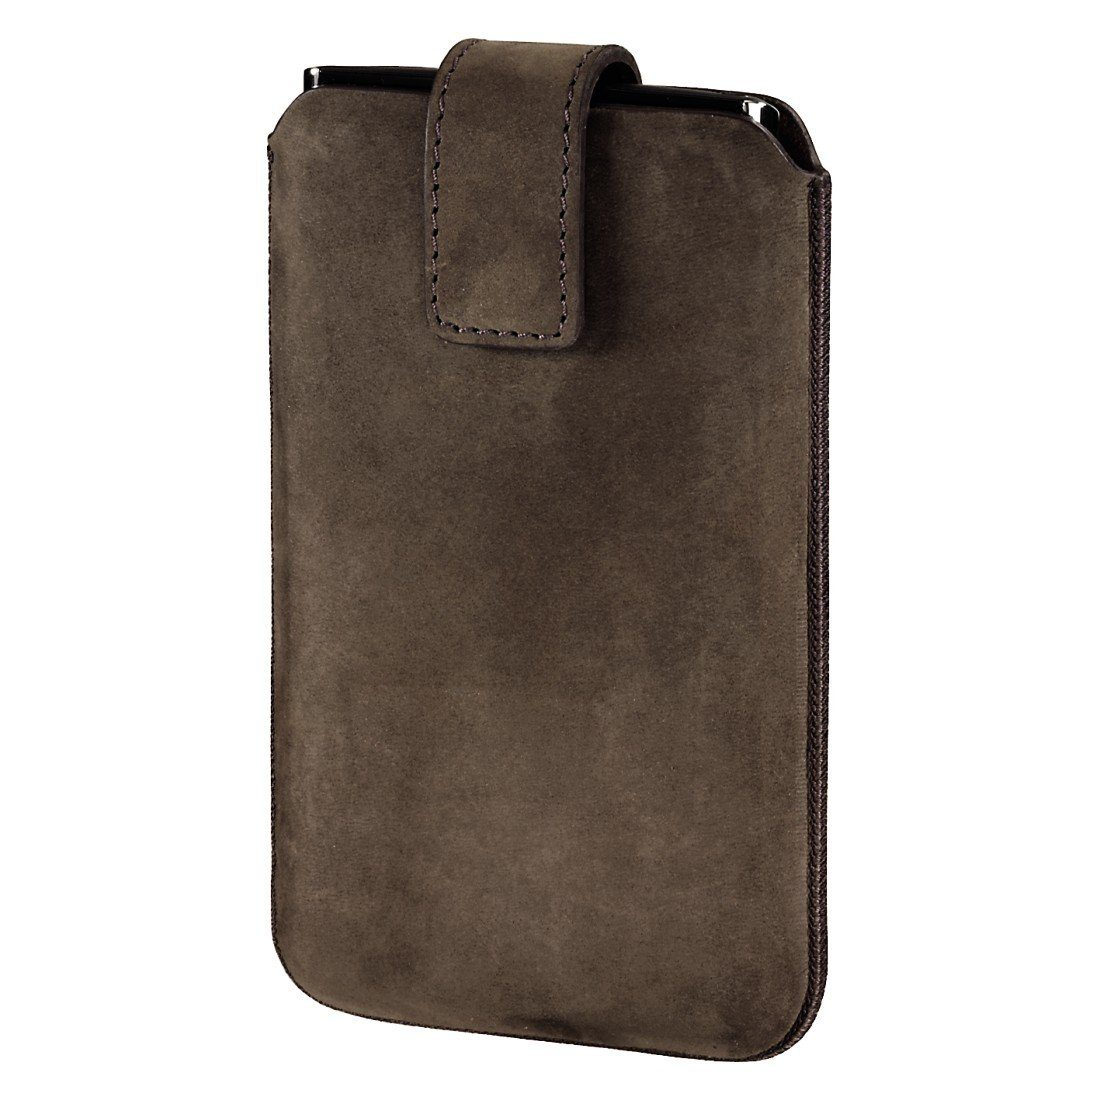 Hama Smartphone-Sleeve Chic Case, Gr. XXL, Braun